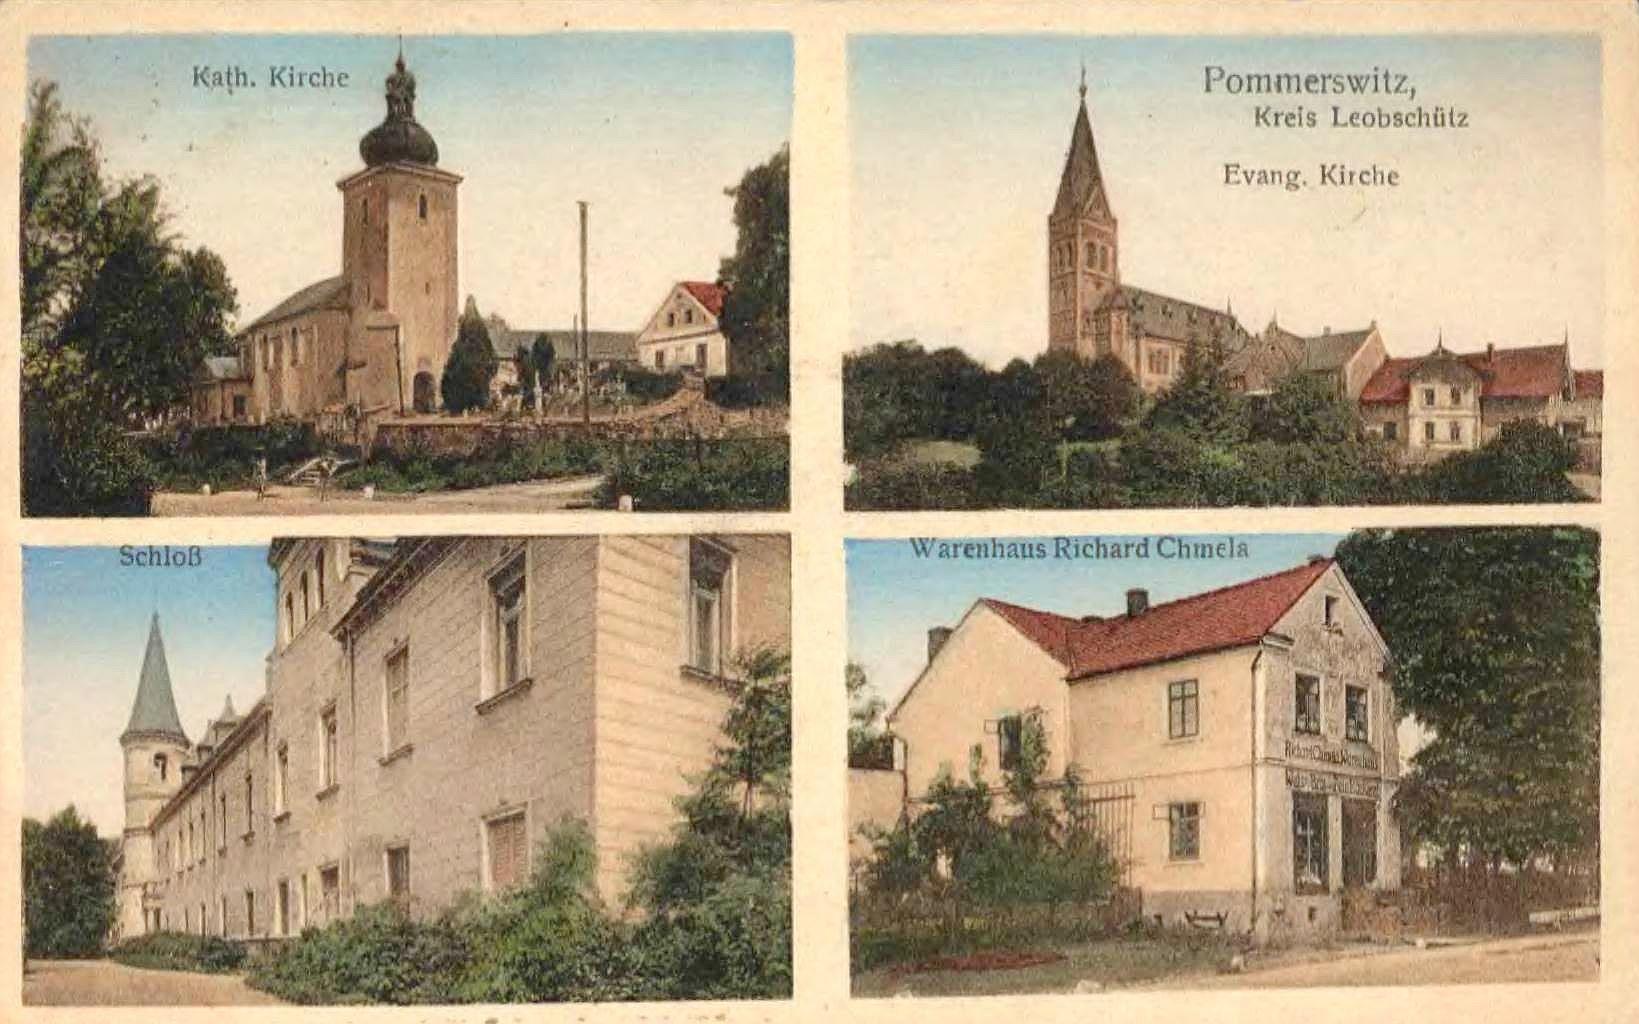 http://fotopolska.eu/foto/375/375861.jpg